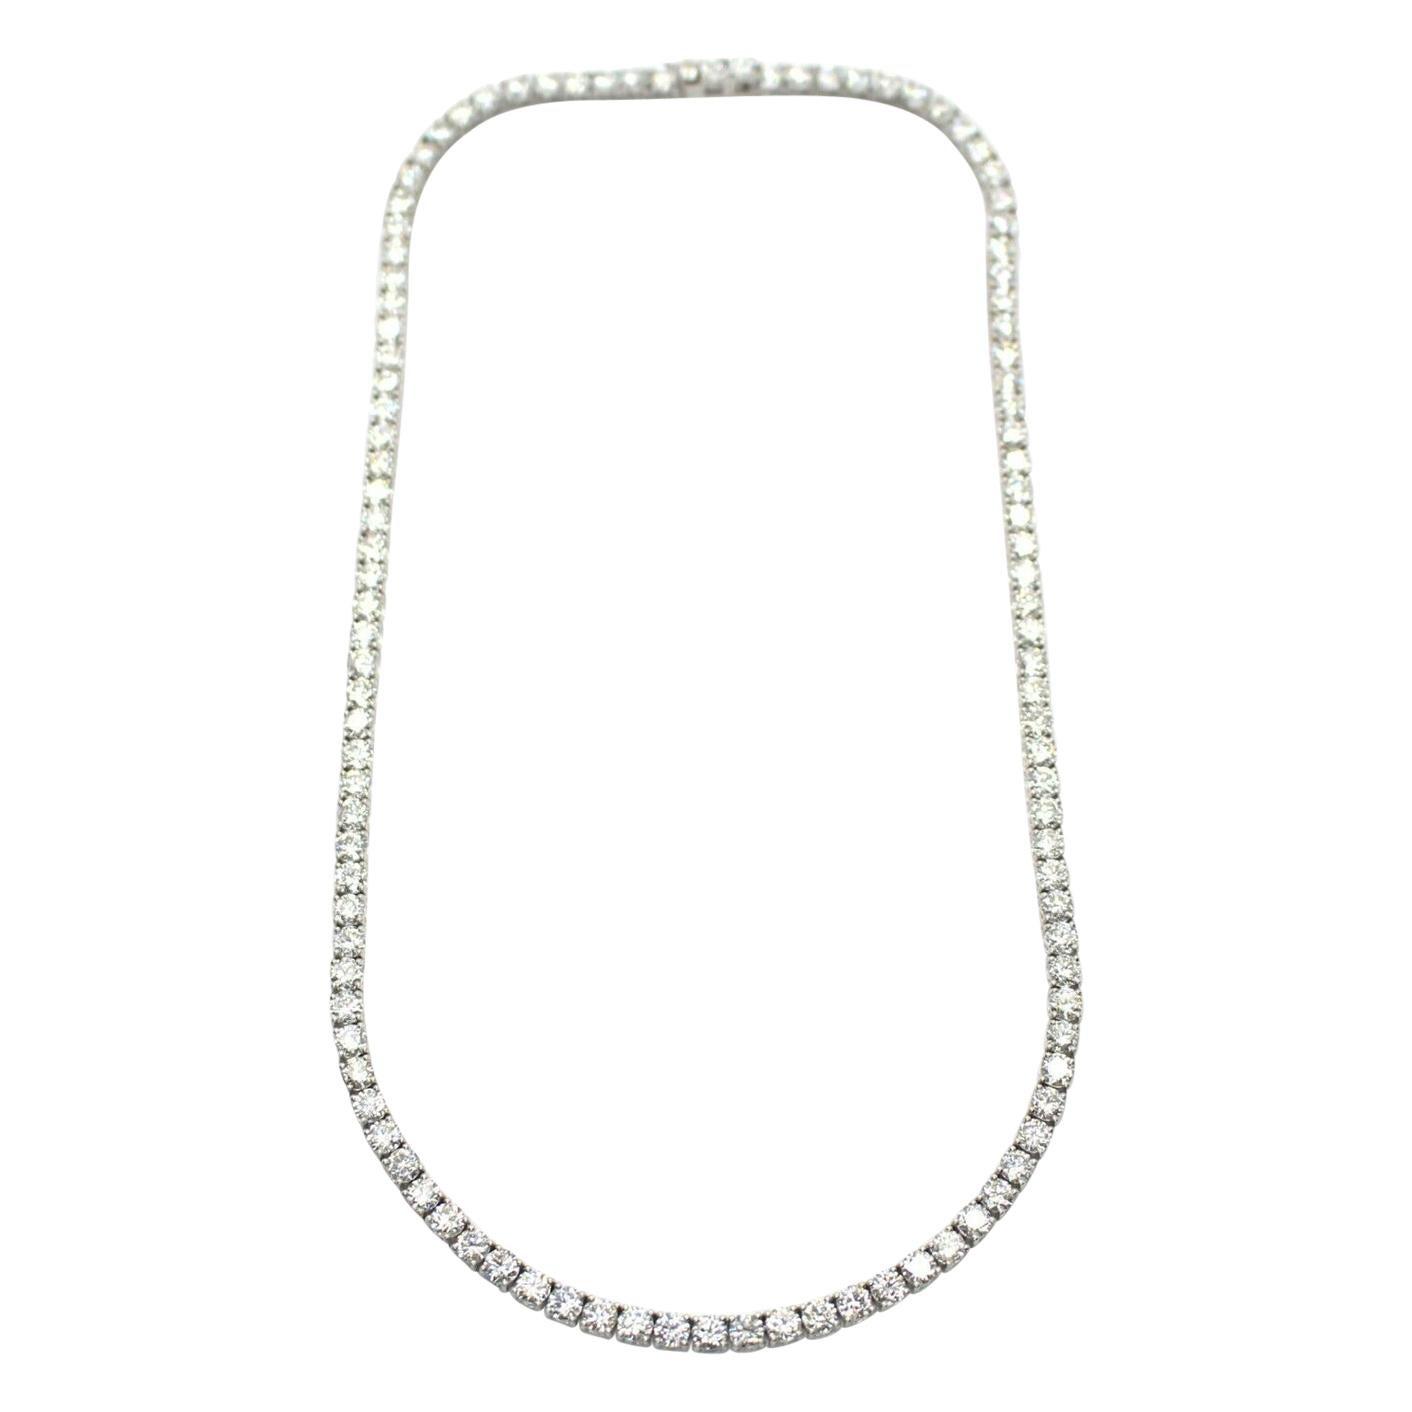 18k White Gold Straight Diamond Tennis Bracelet 20.51cts